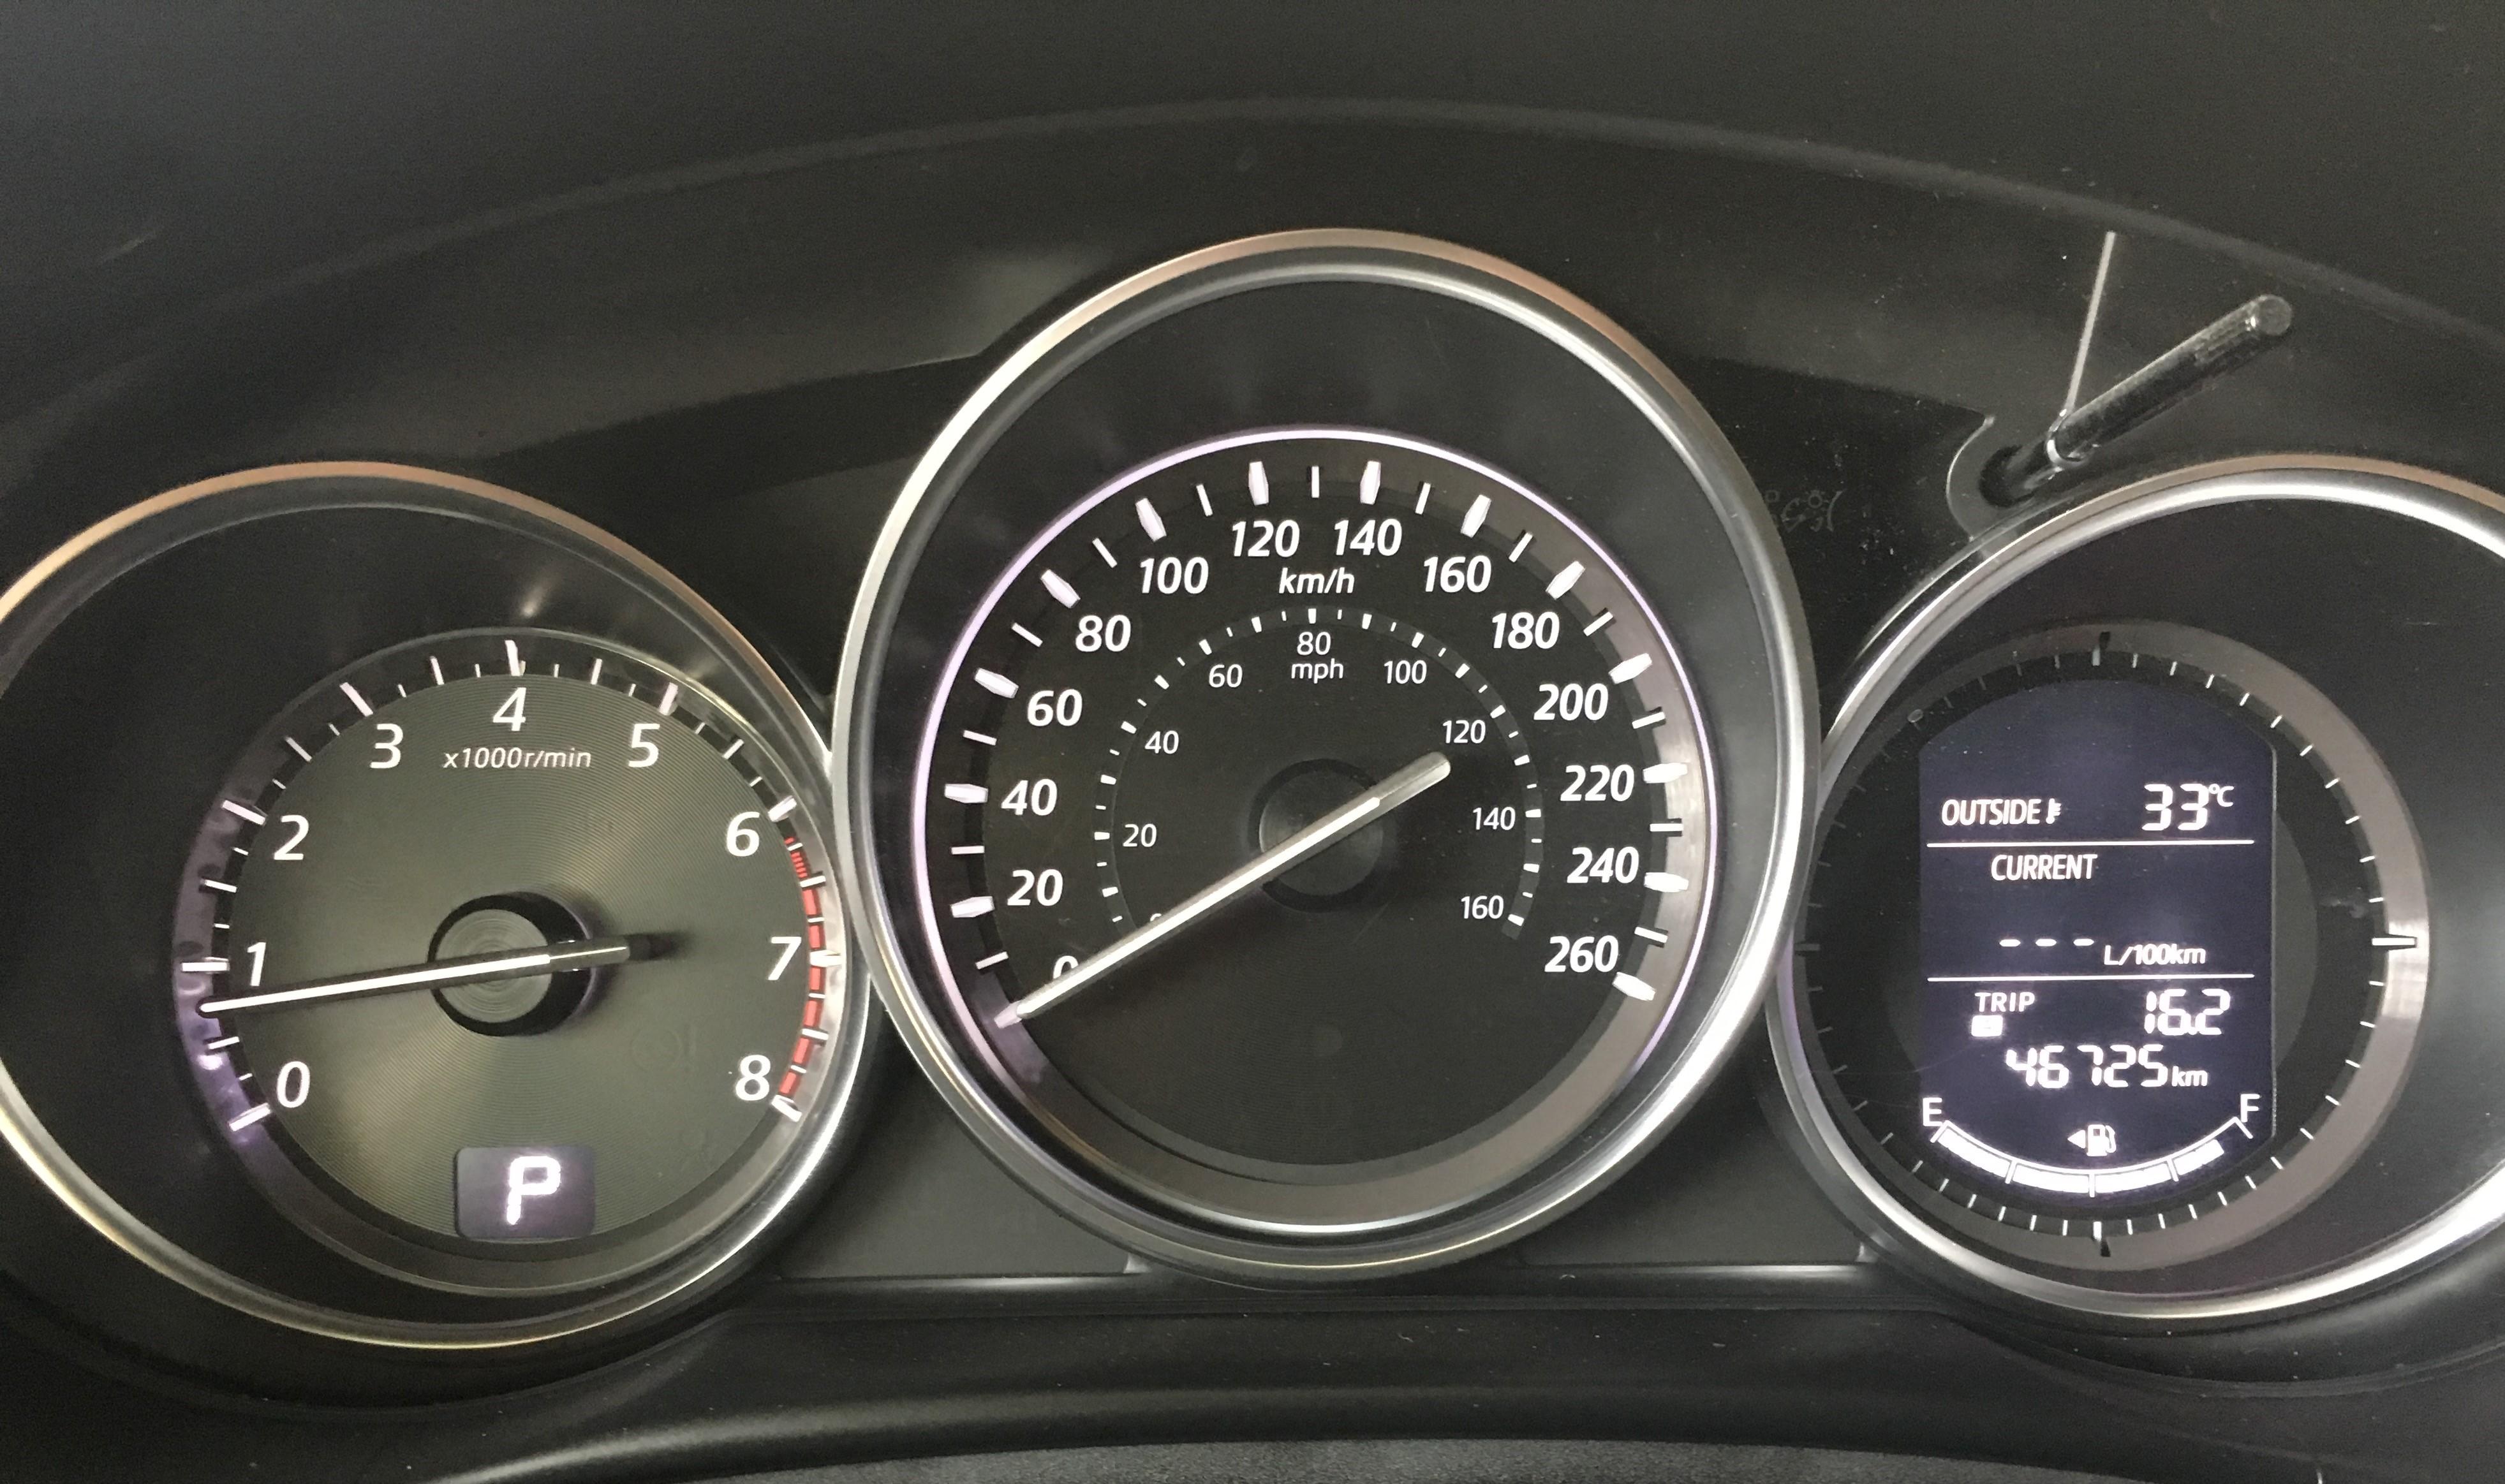 Home Gt Mazda Cx5 Gt Audio Electrical Gt Remote Engine Start Cx5